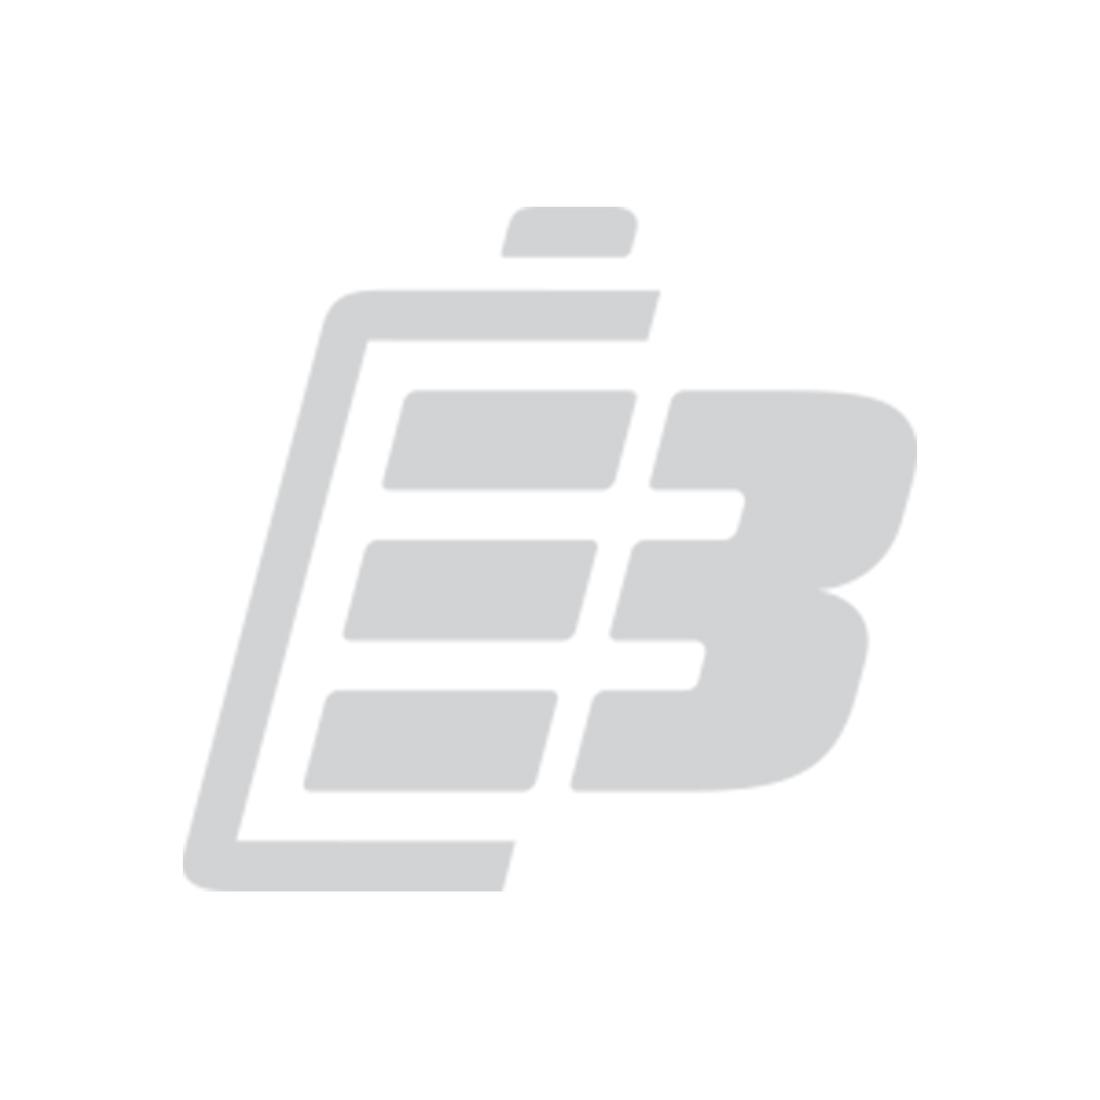 olight cr123A_battery carrier_1